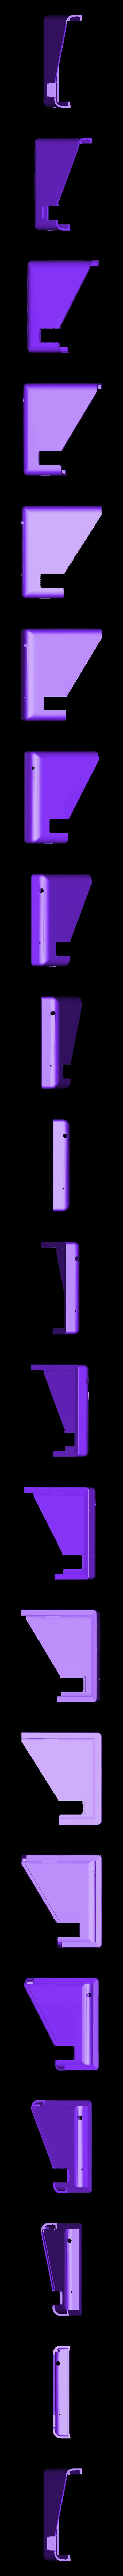 cova113_top.stl Download free STL file Fairphone 2 cover • 3D printer model, unwohlpol